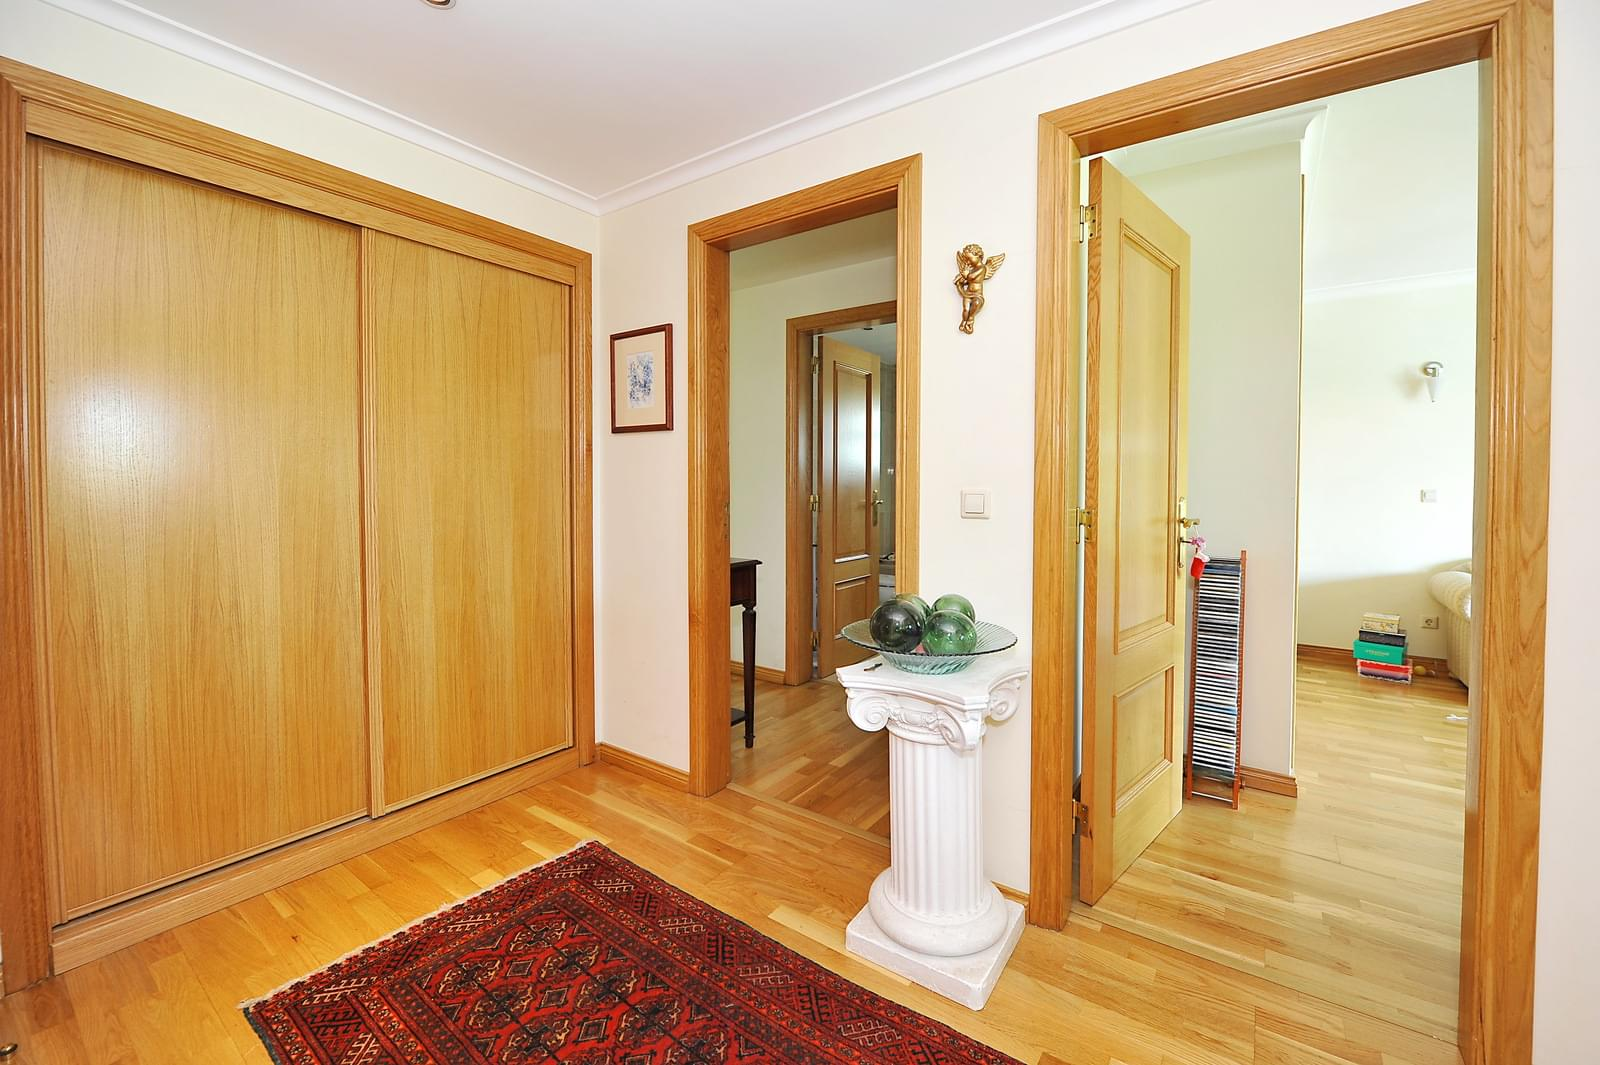 pf17941-apartamento-t3-oeiras-8cb65dff-4a04-4eff-8991-1d62bf8476cf